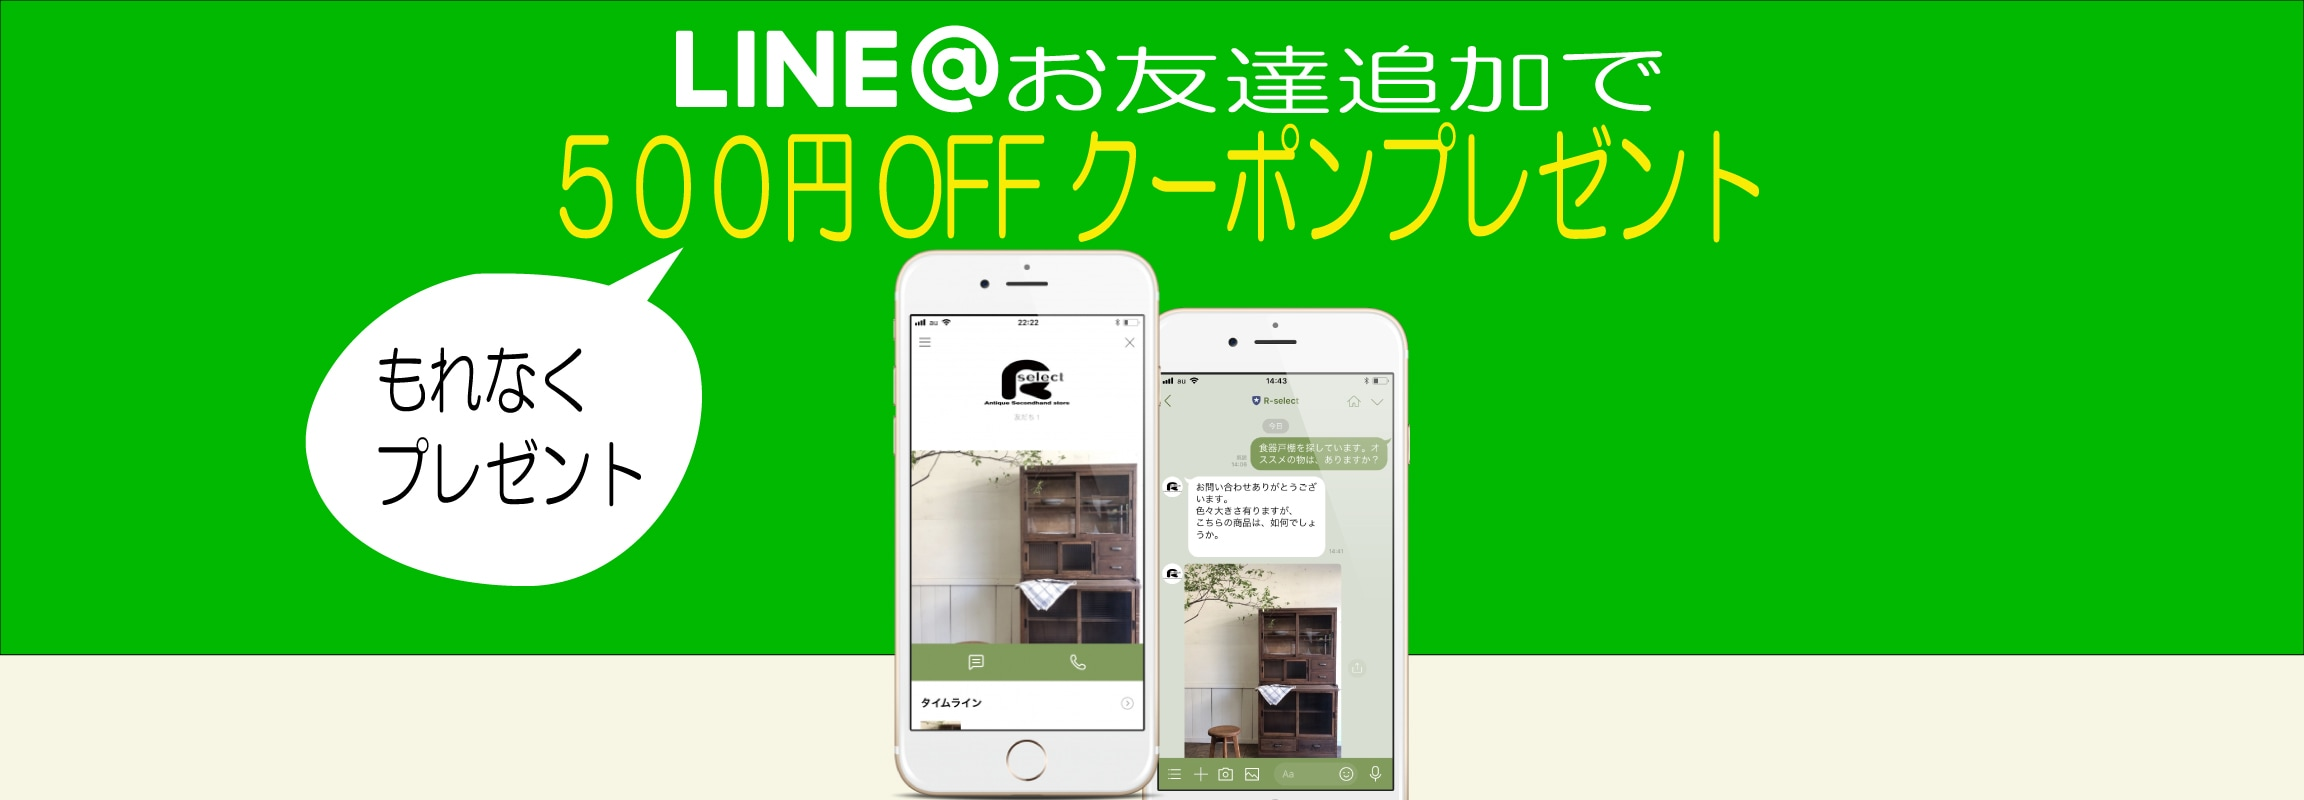 lineお友達追加ご案内(R-select)